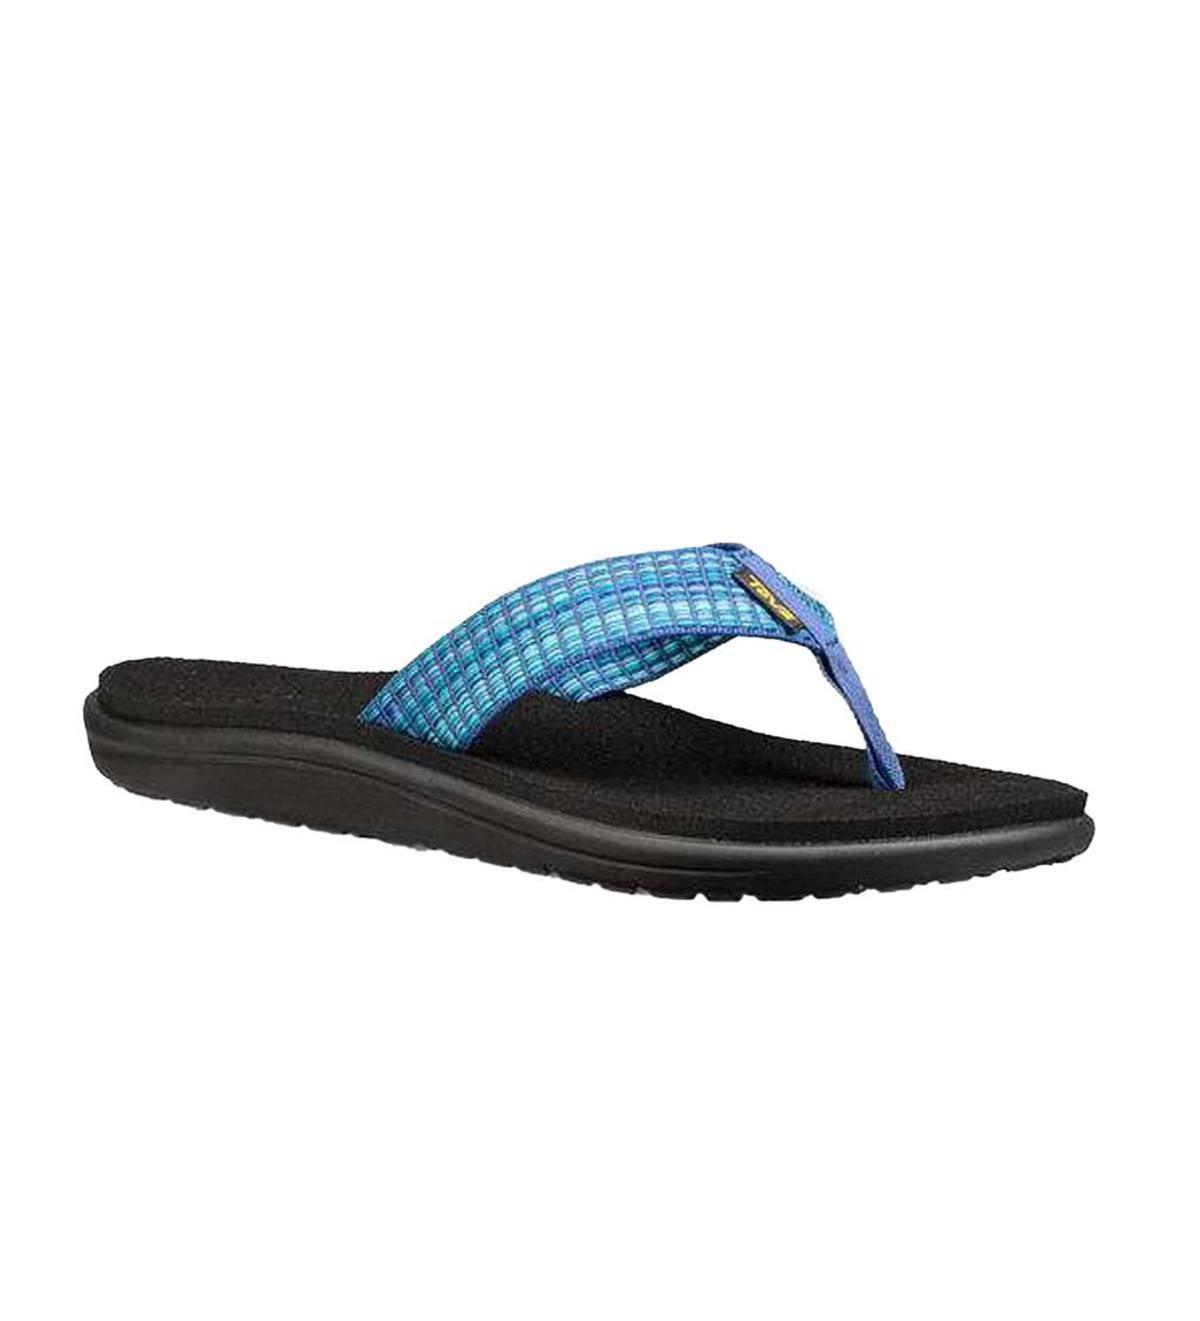 4c1c14d93fc86 Teva Women s Mush Voya Flip - Multi Blue - Size 6